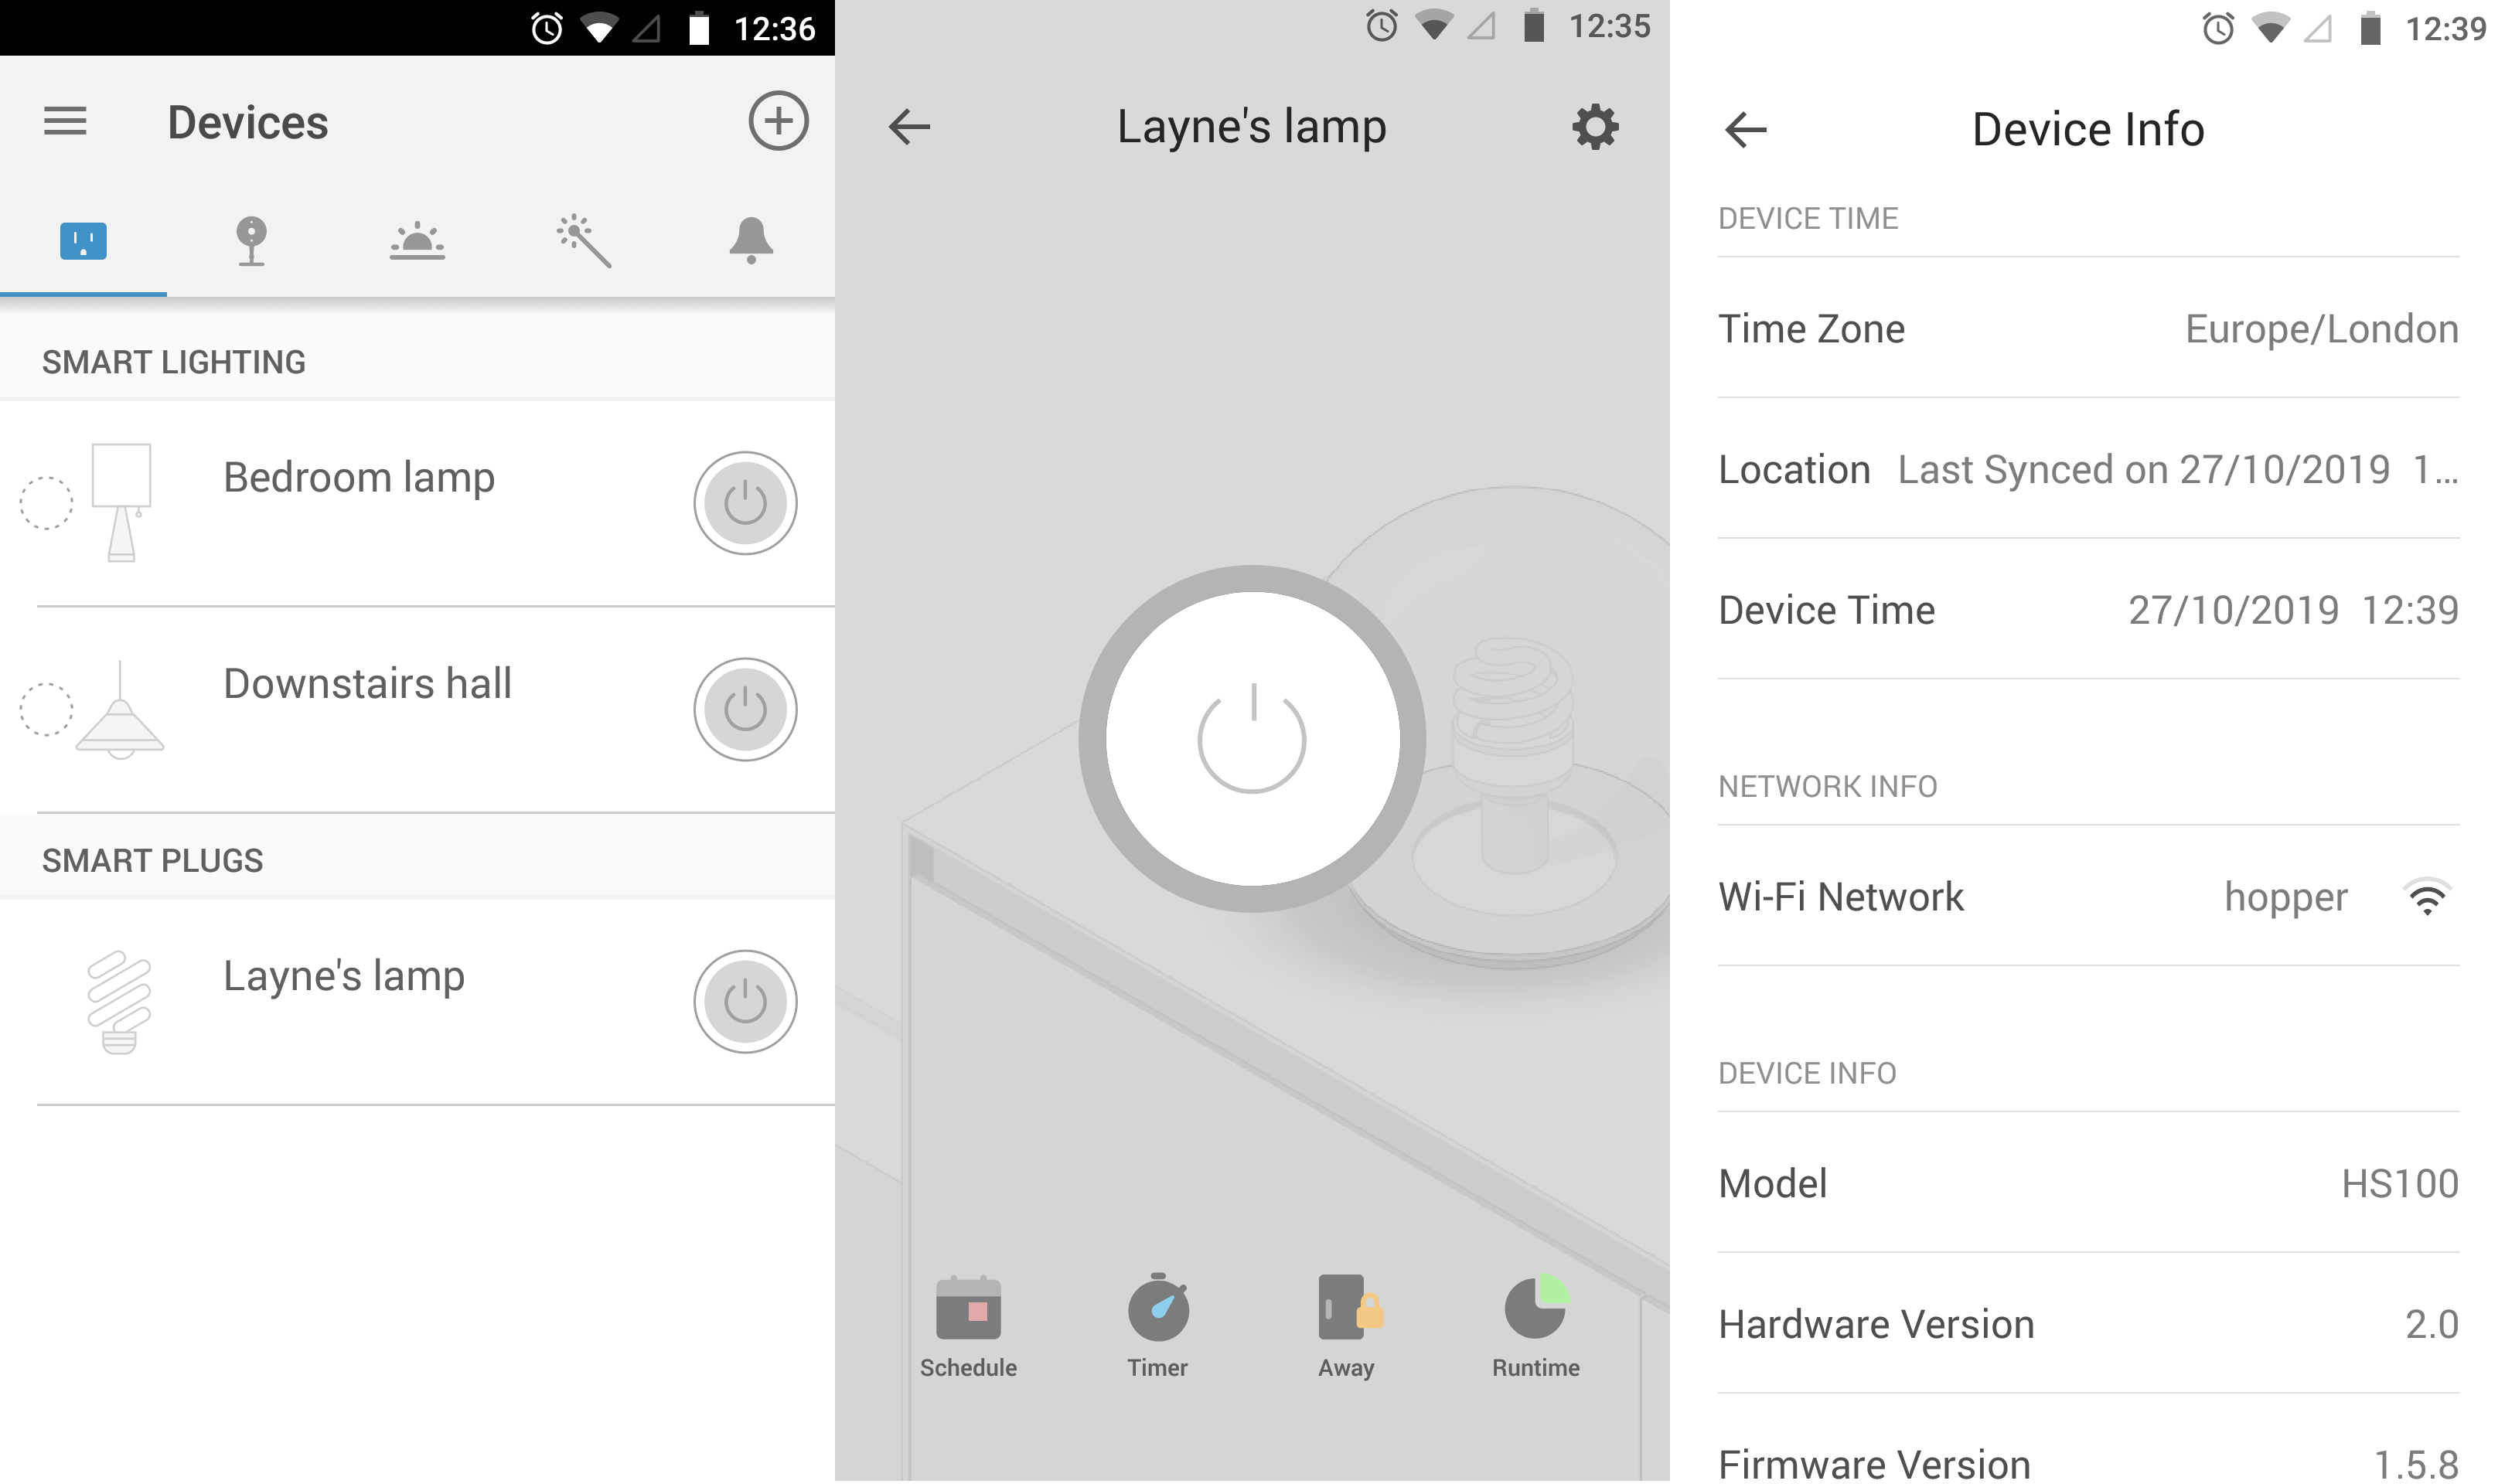 TP-Link Kasa app screenshots showing device configuration